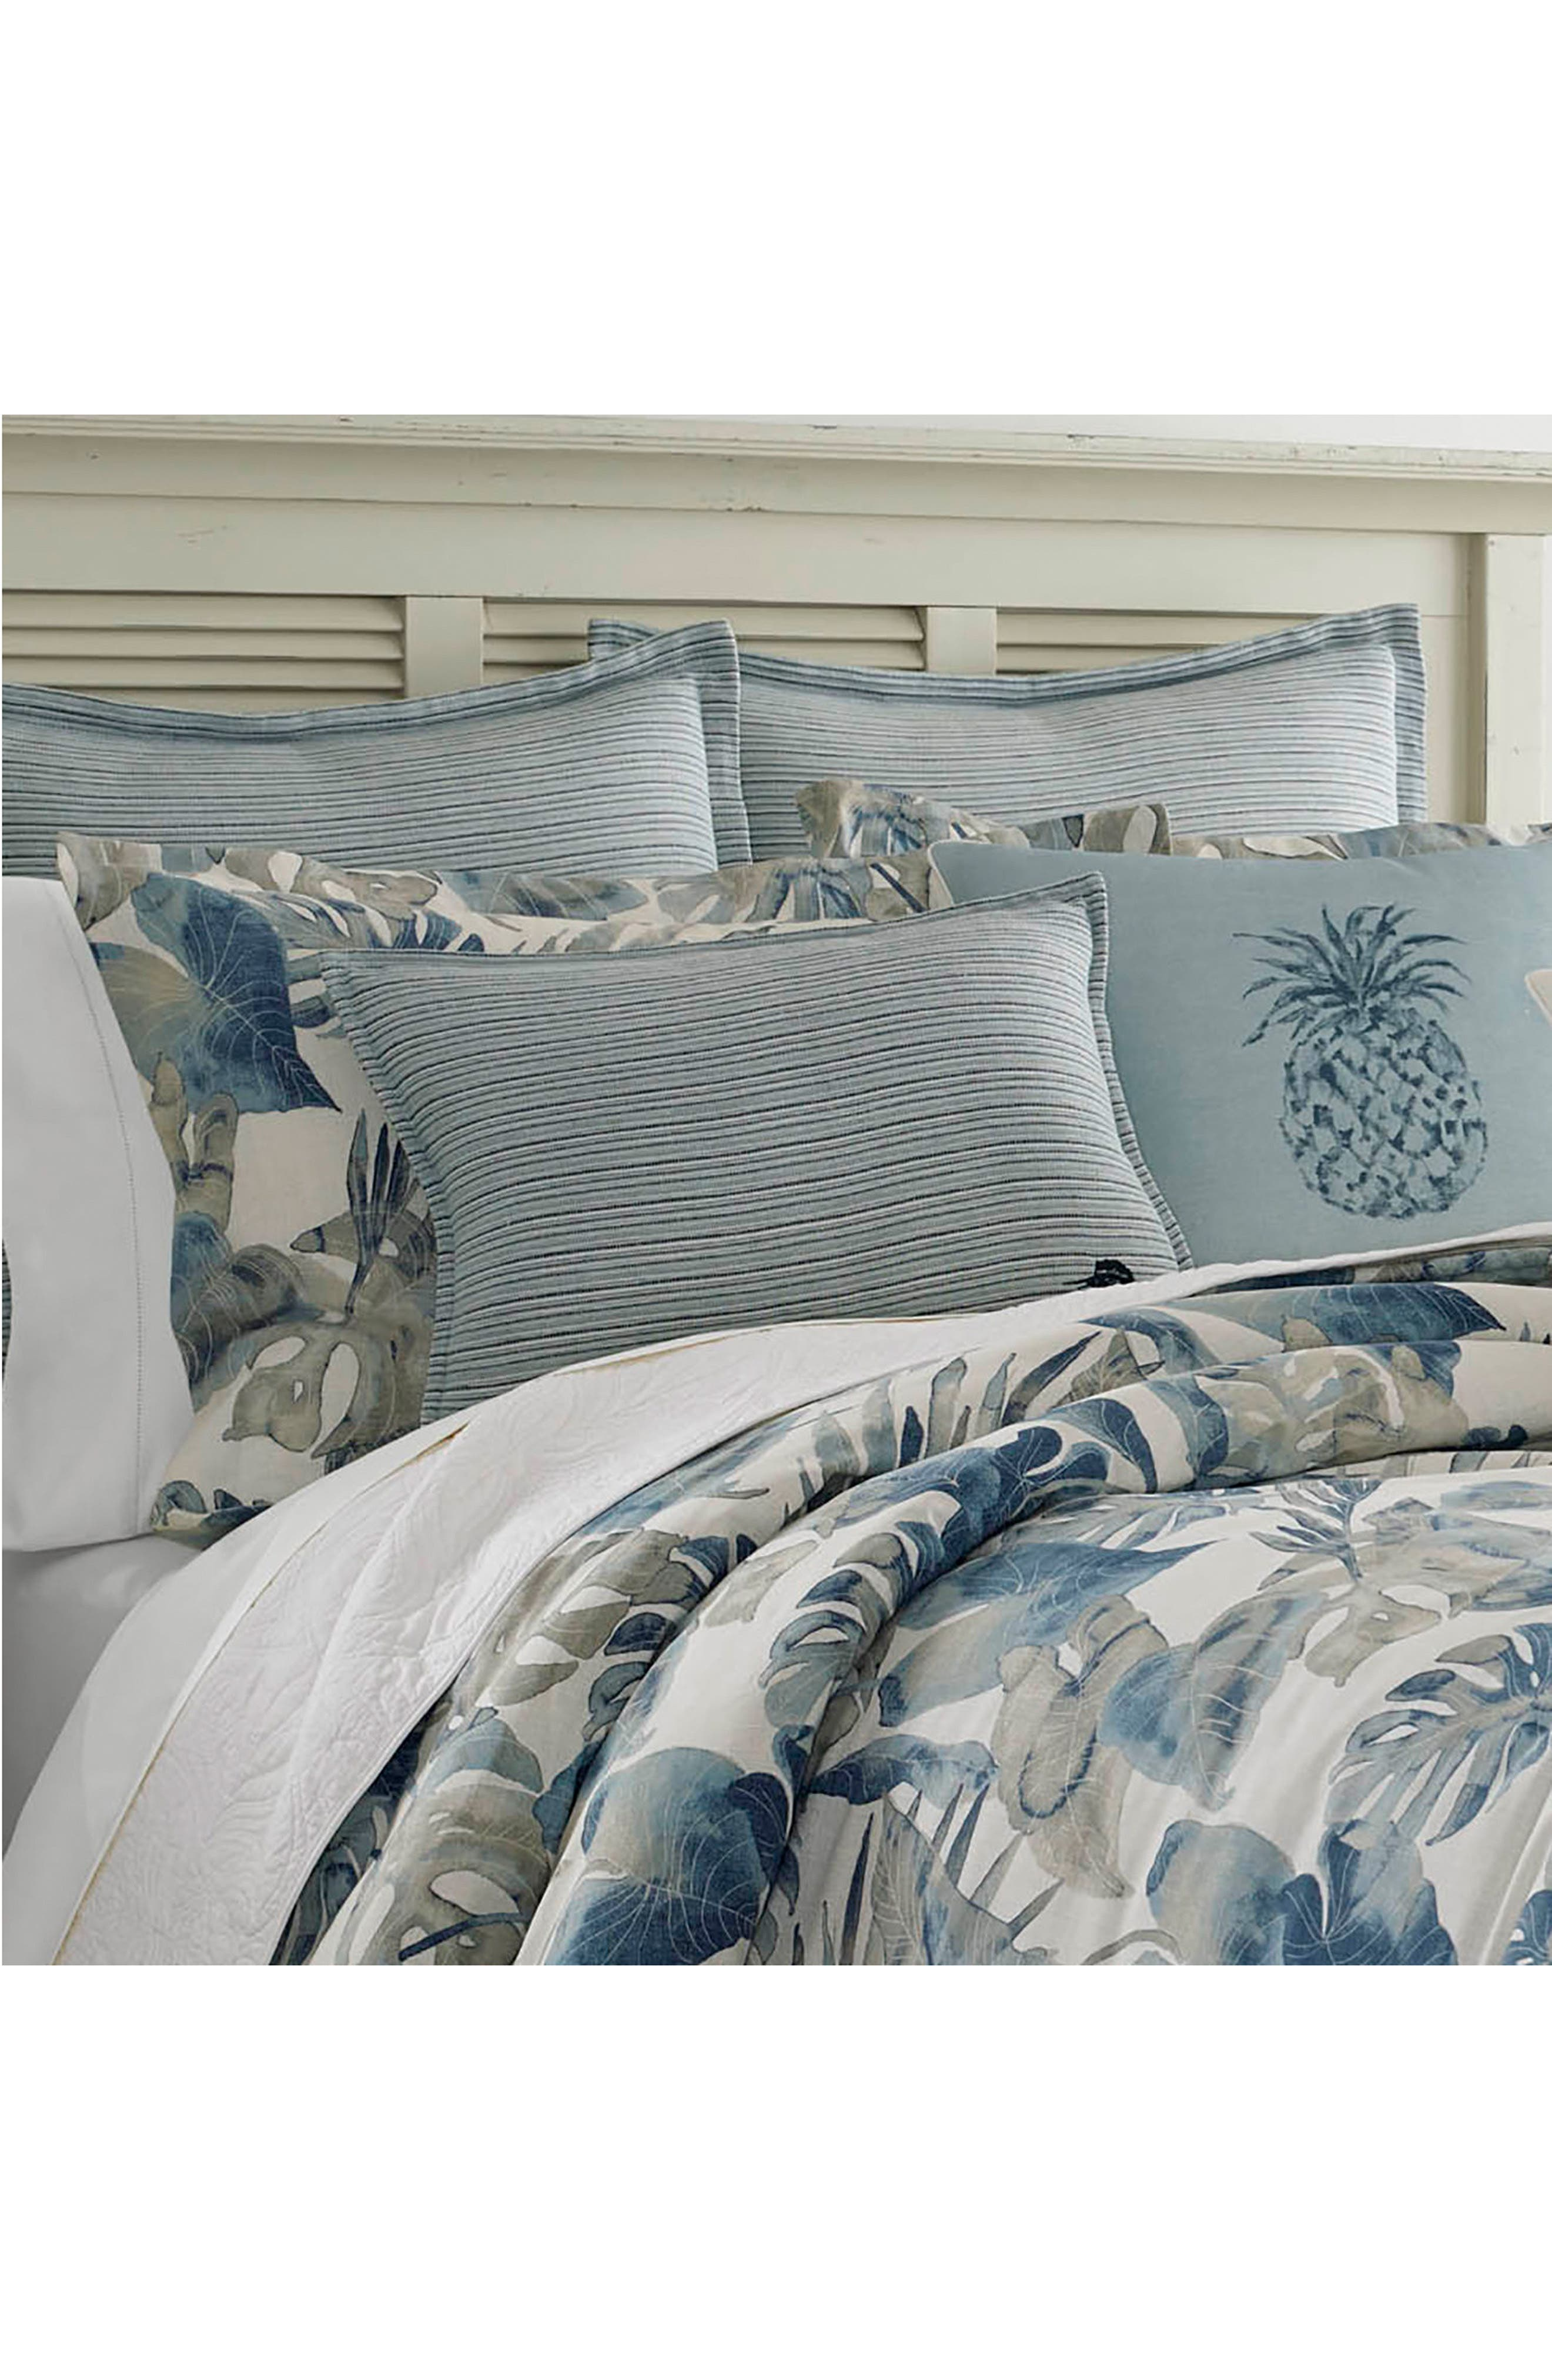 TOMMY BAHAMA,                             Raw Coast Comforter, Sham & Bed Skirt Set,                             Alternate thumbnail 4, color,                             400